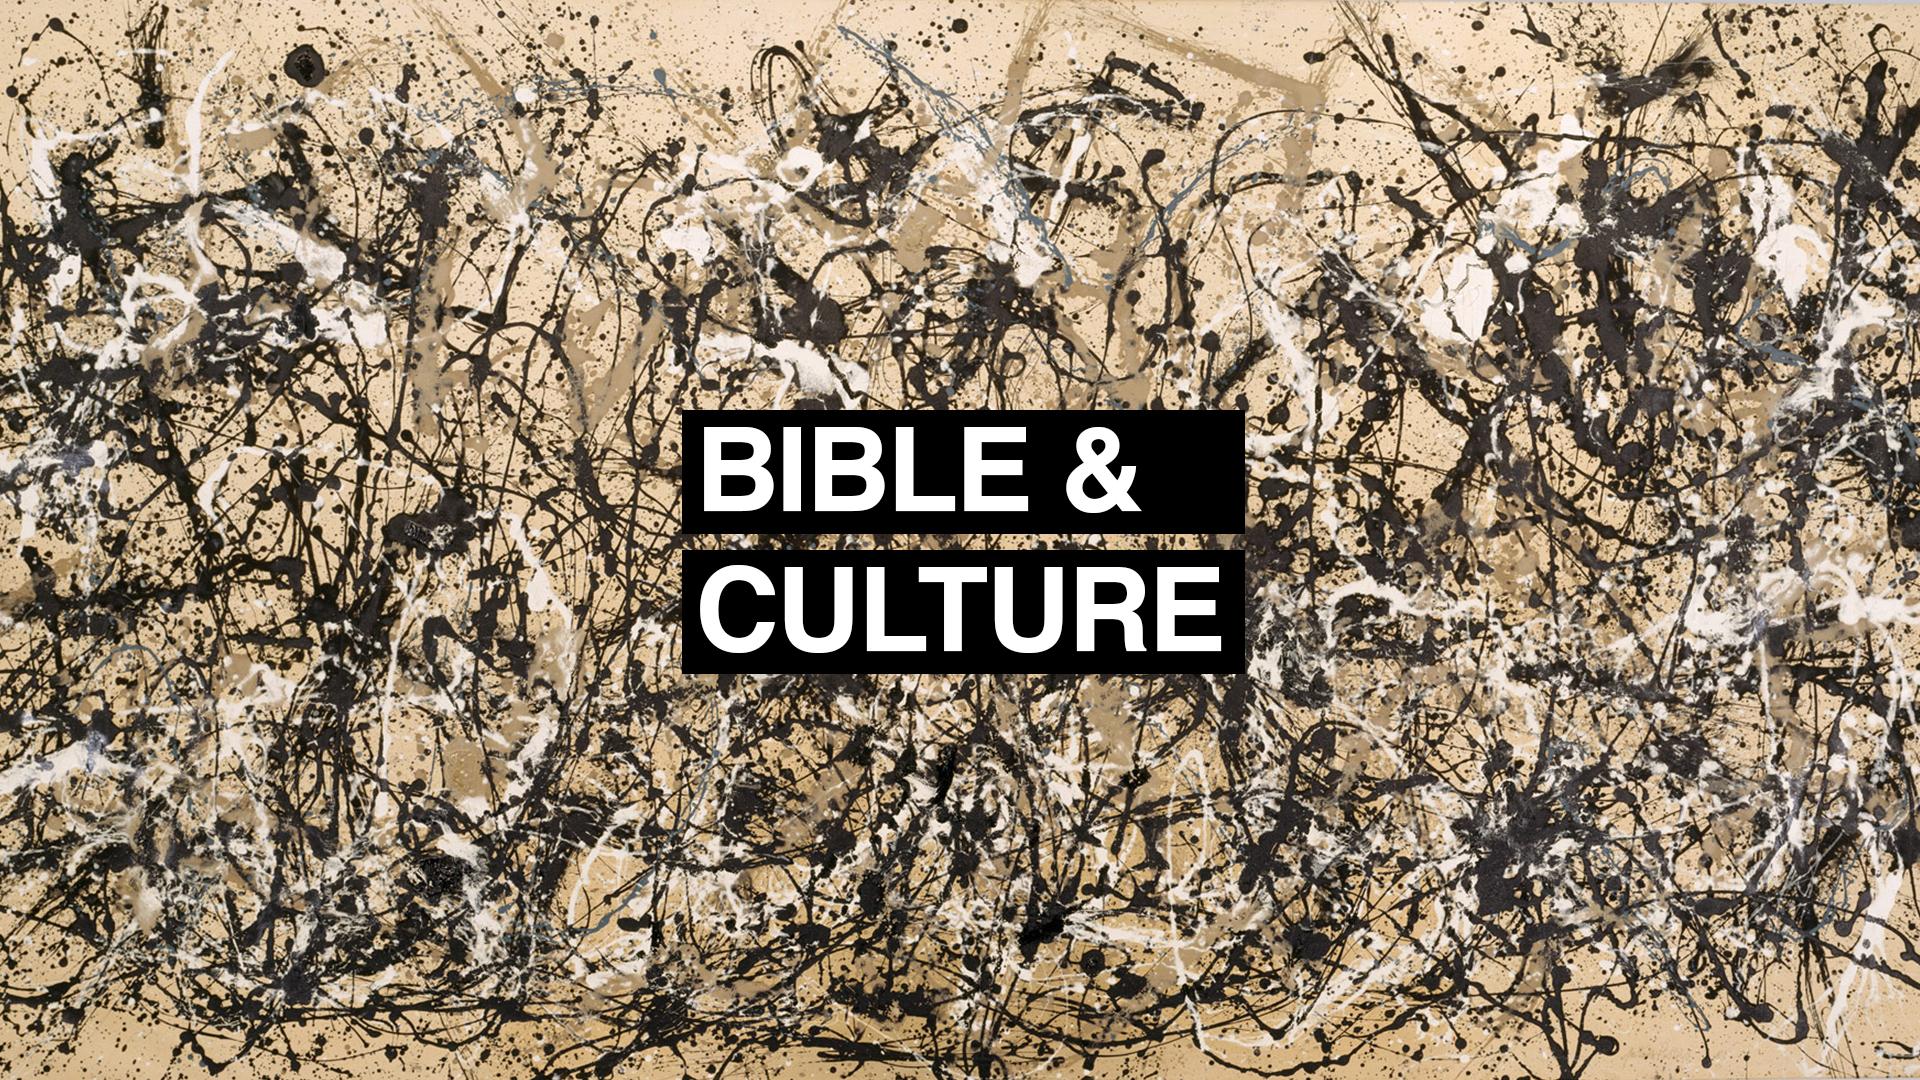 Bible & Culture